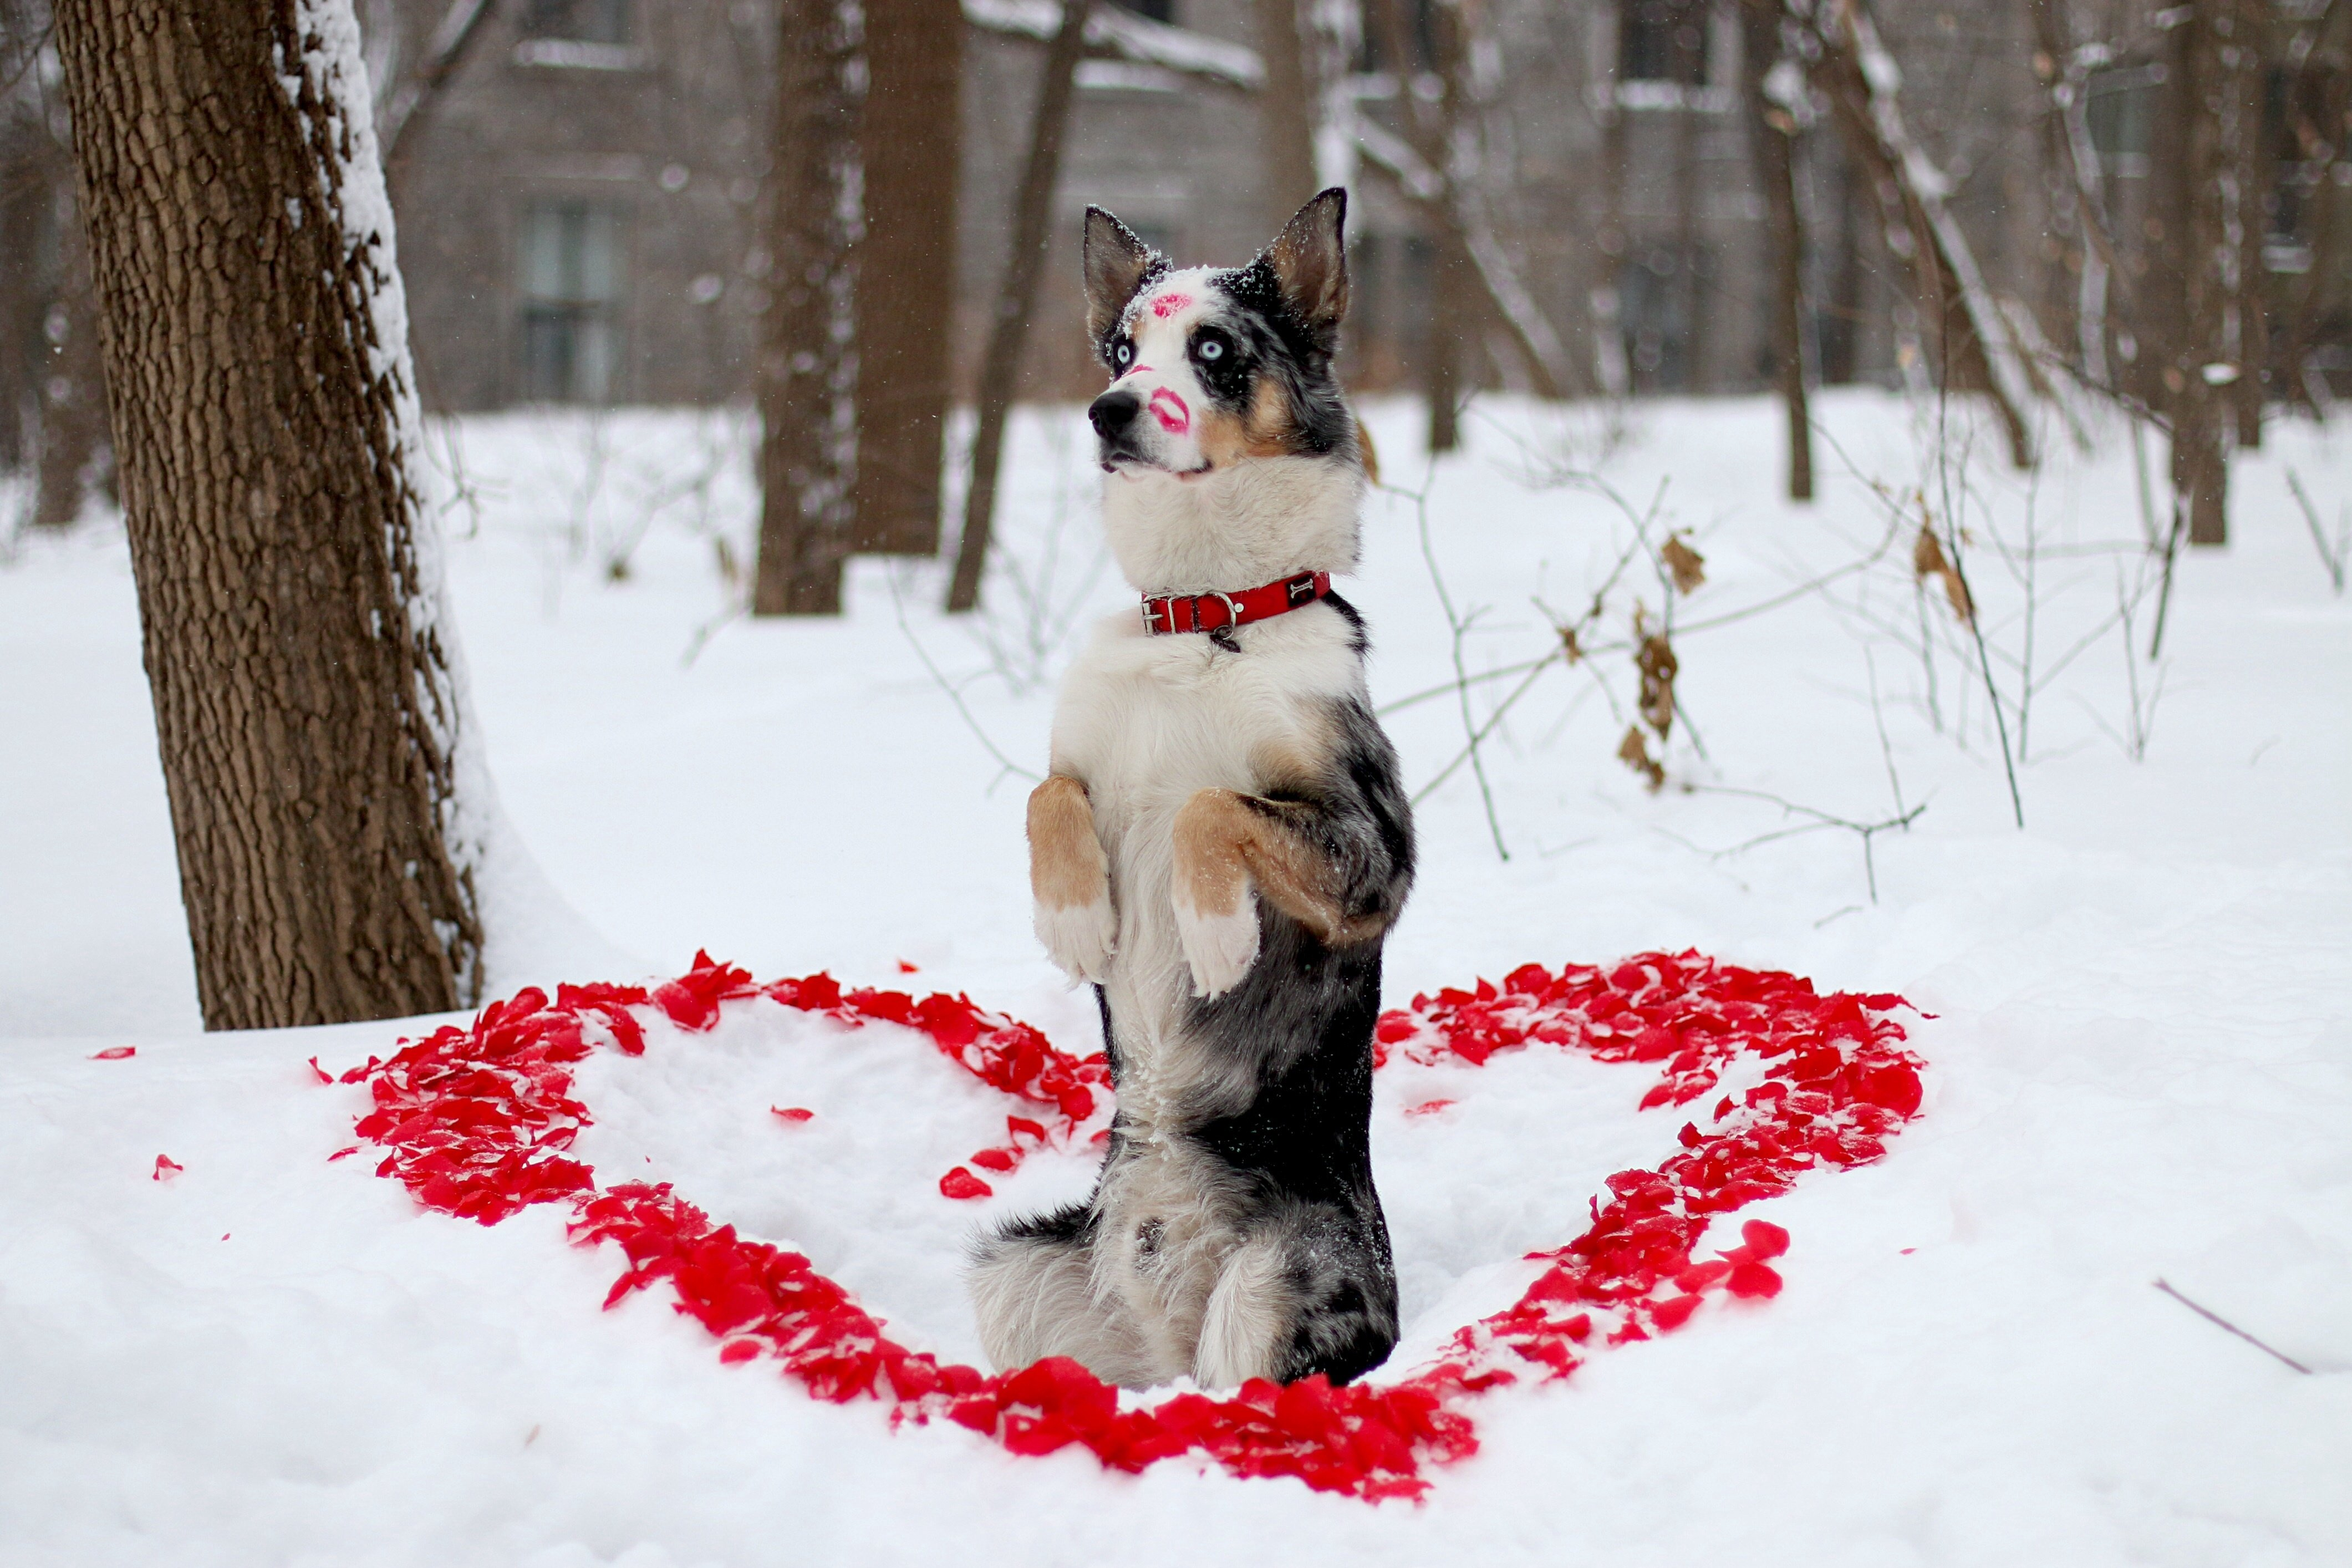 Dog friend winter look dog heart mood love wallpaper 4242x2828 559659 wallpaperup - Keeping outdoor dog happy winter ...